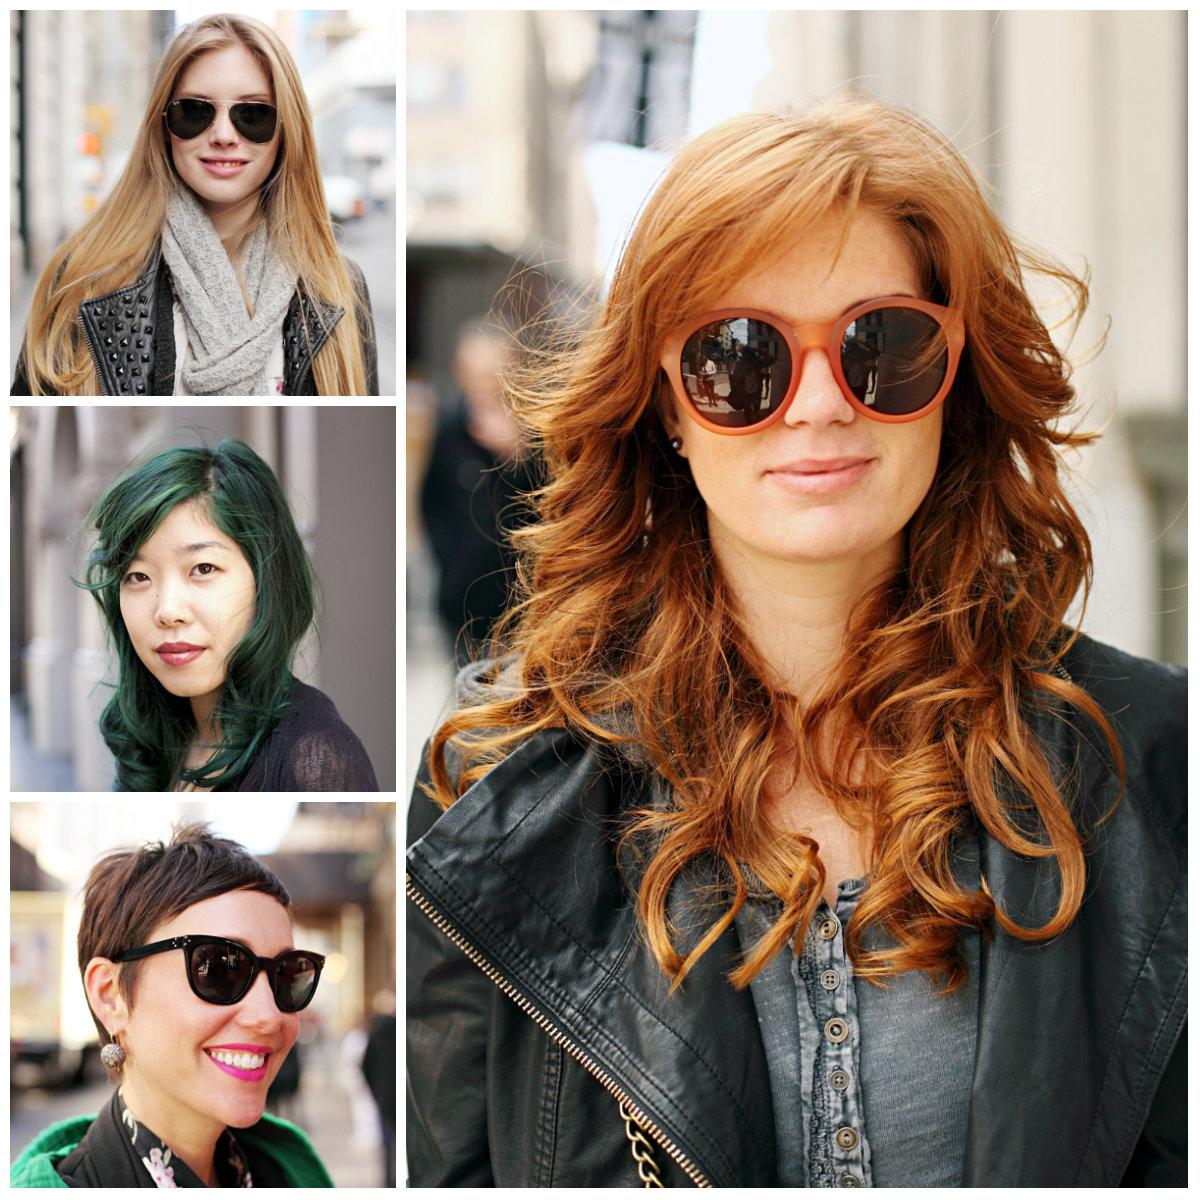 Trendiest Hairstyles for 2017